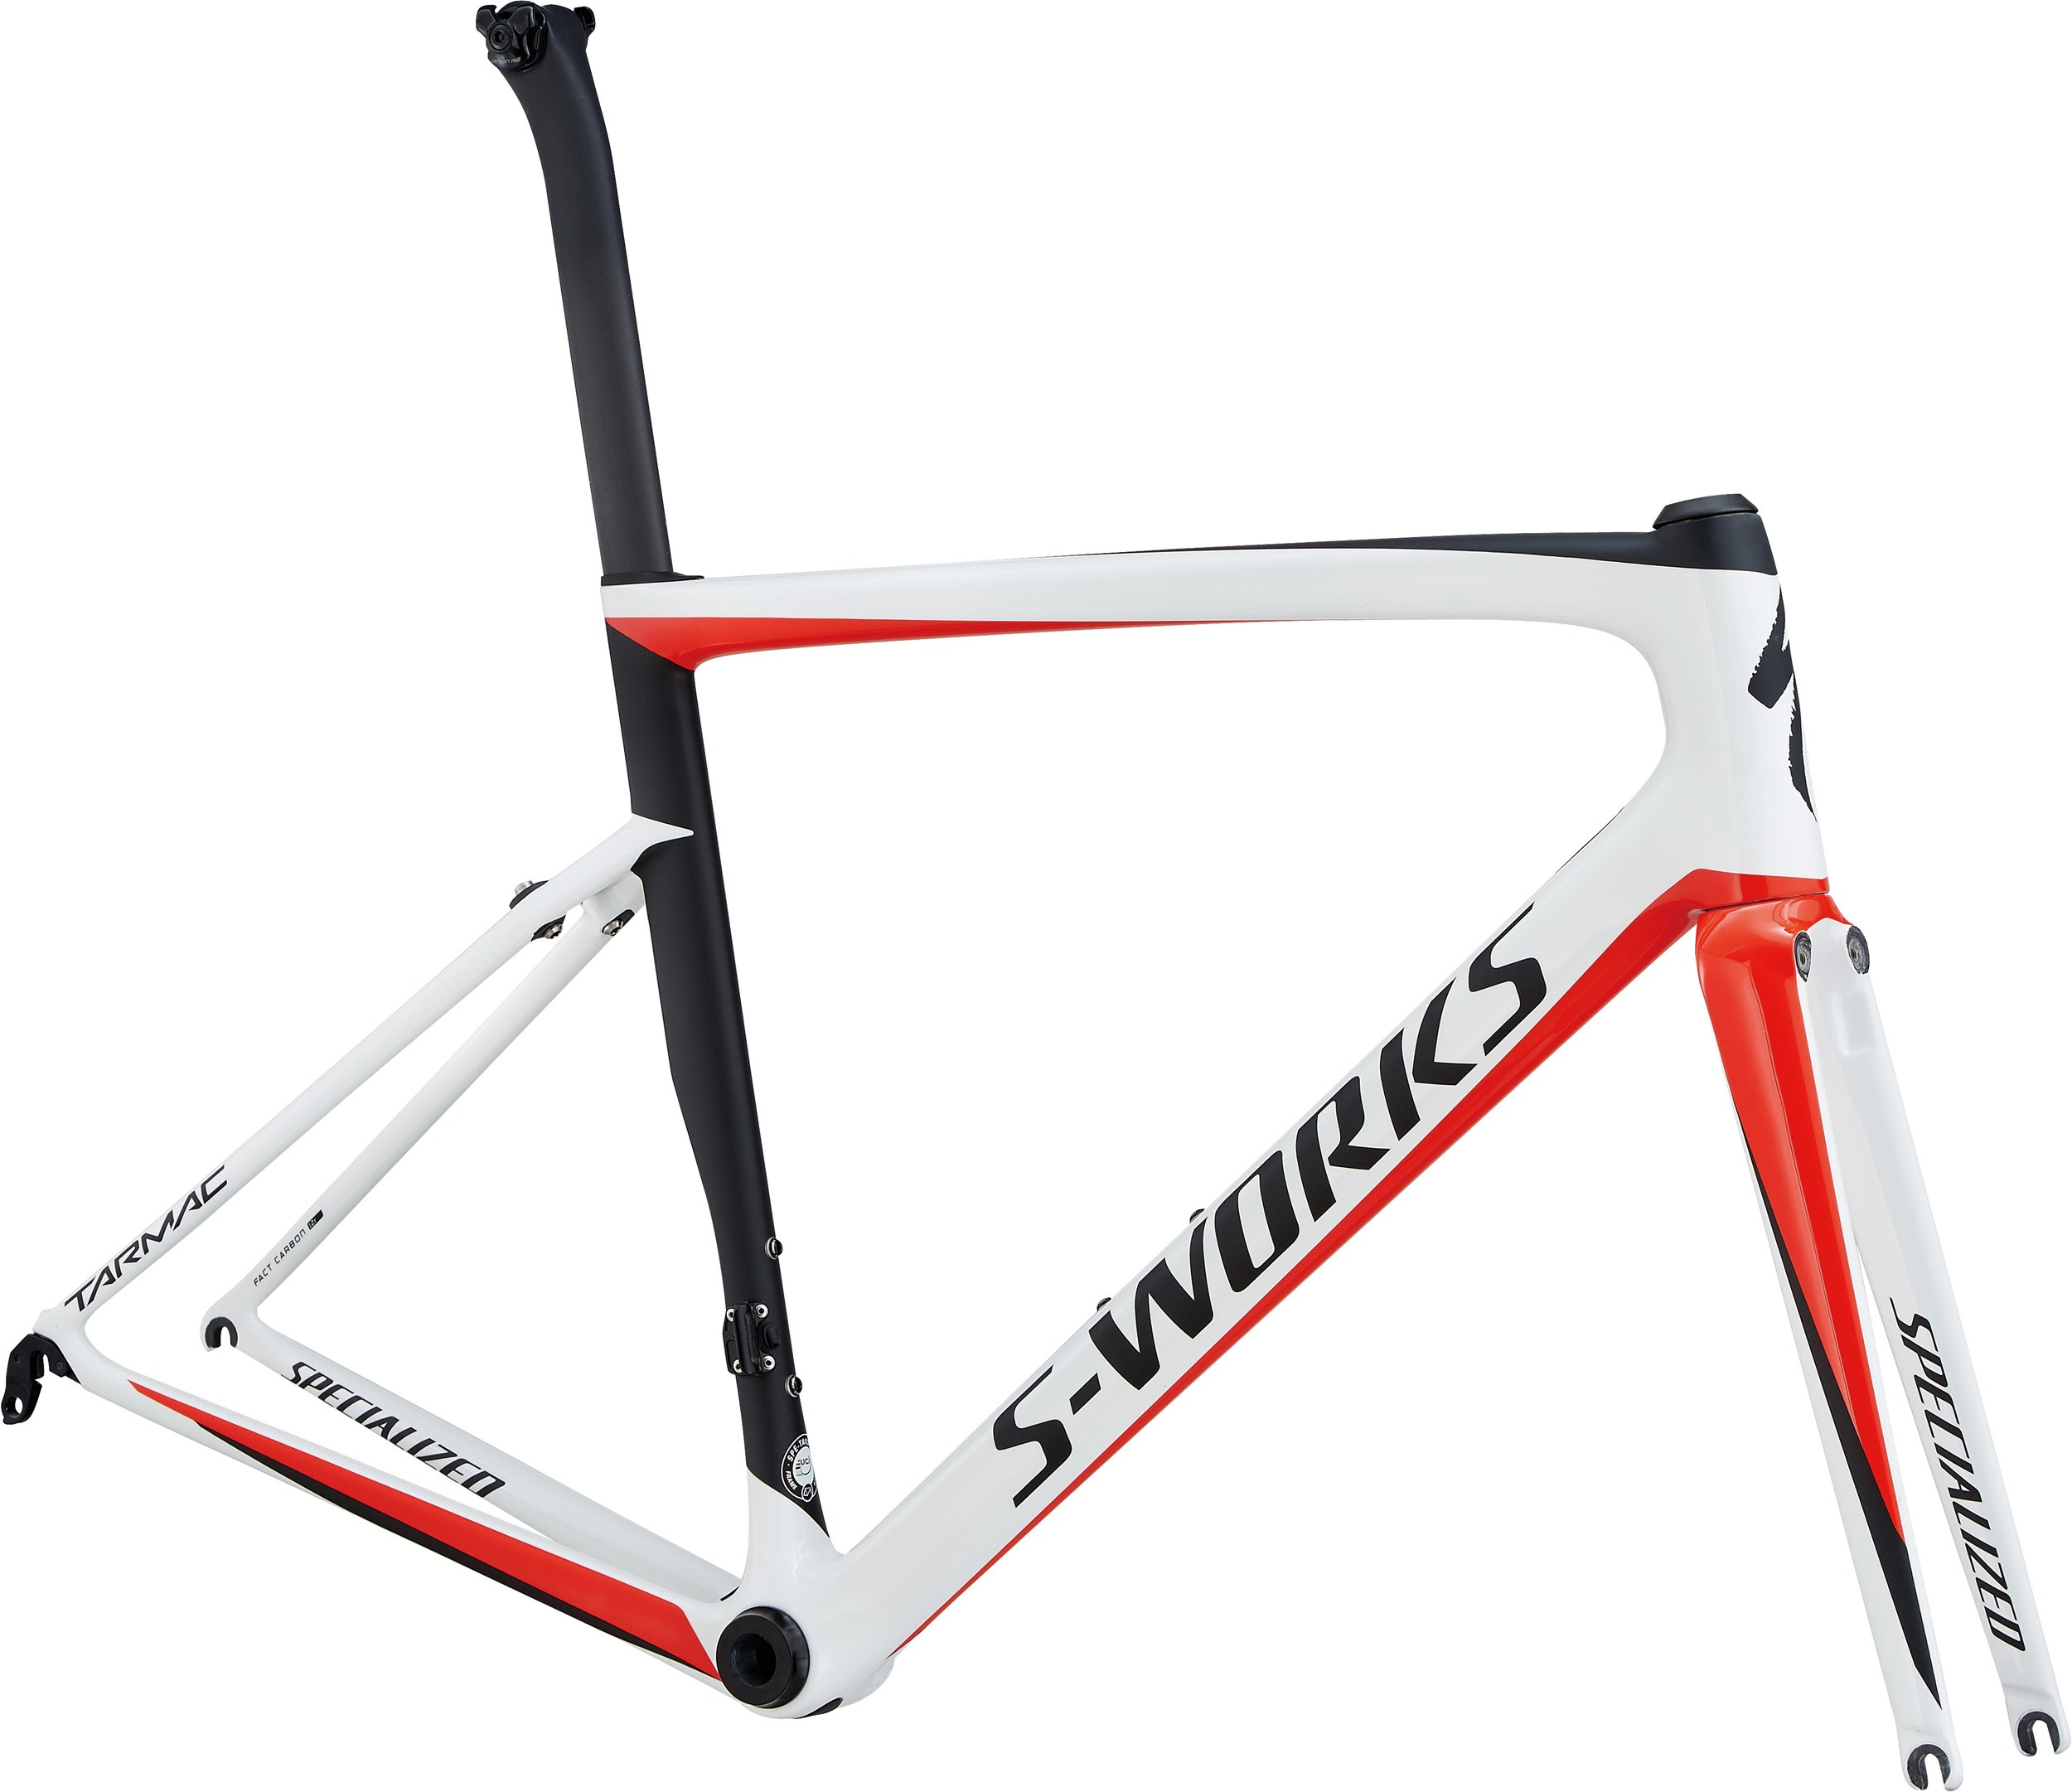 Specialized 2018 La Nuova Sensazionale Tarmac Tech Cycling